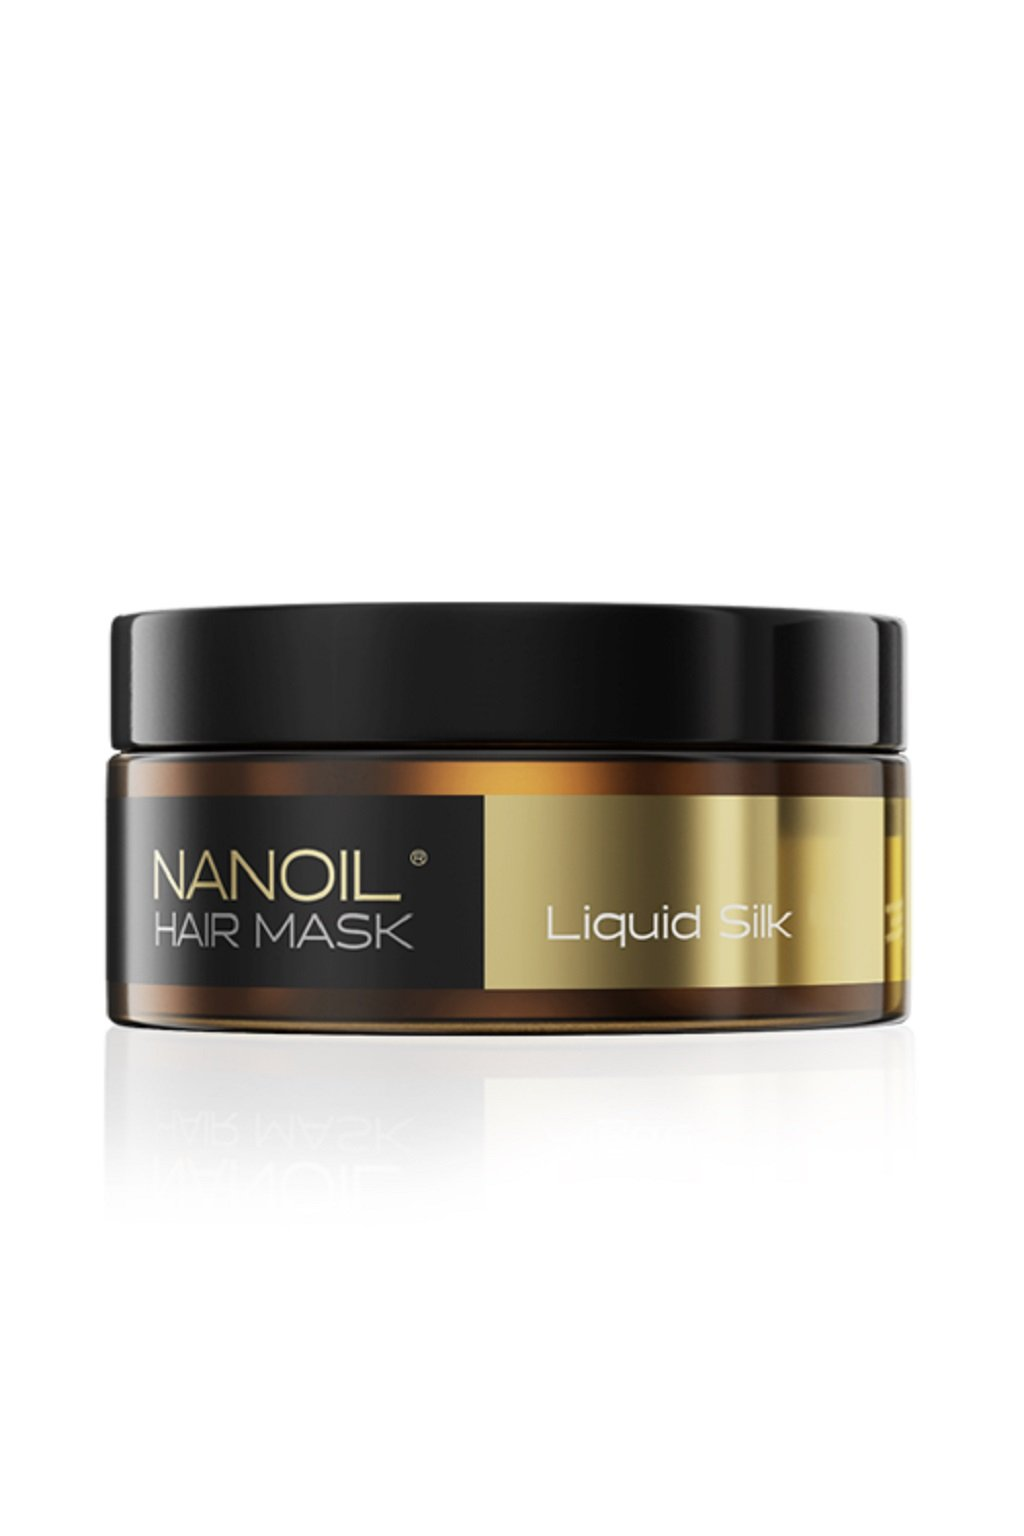 nanoul HAIR MASK maska na vlasy s tekutym hedvabim 300 ml 1